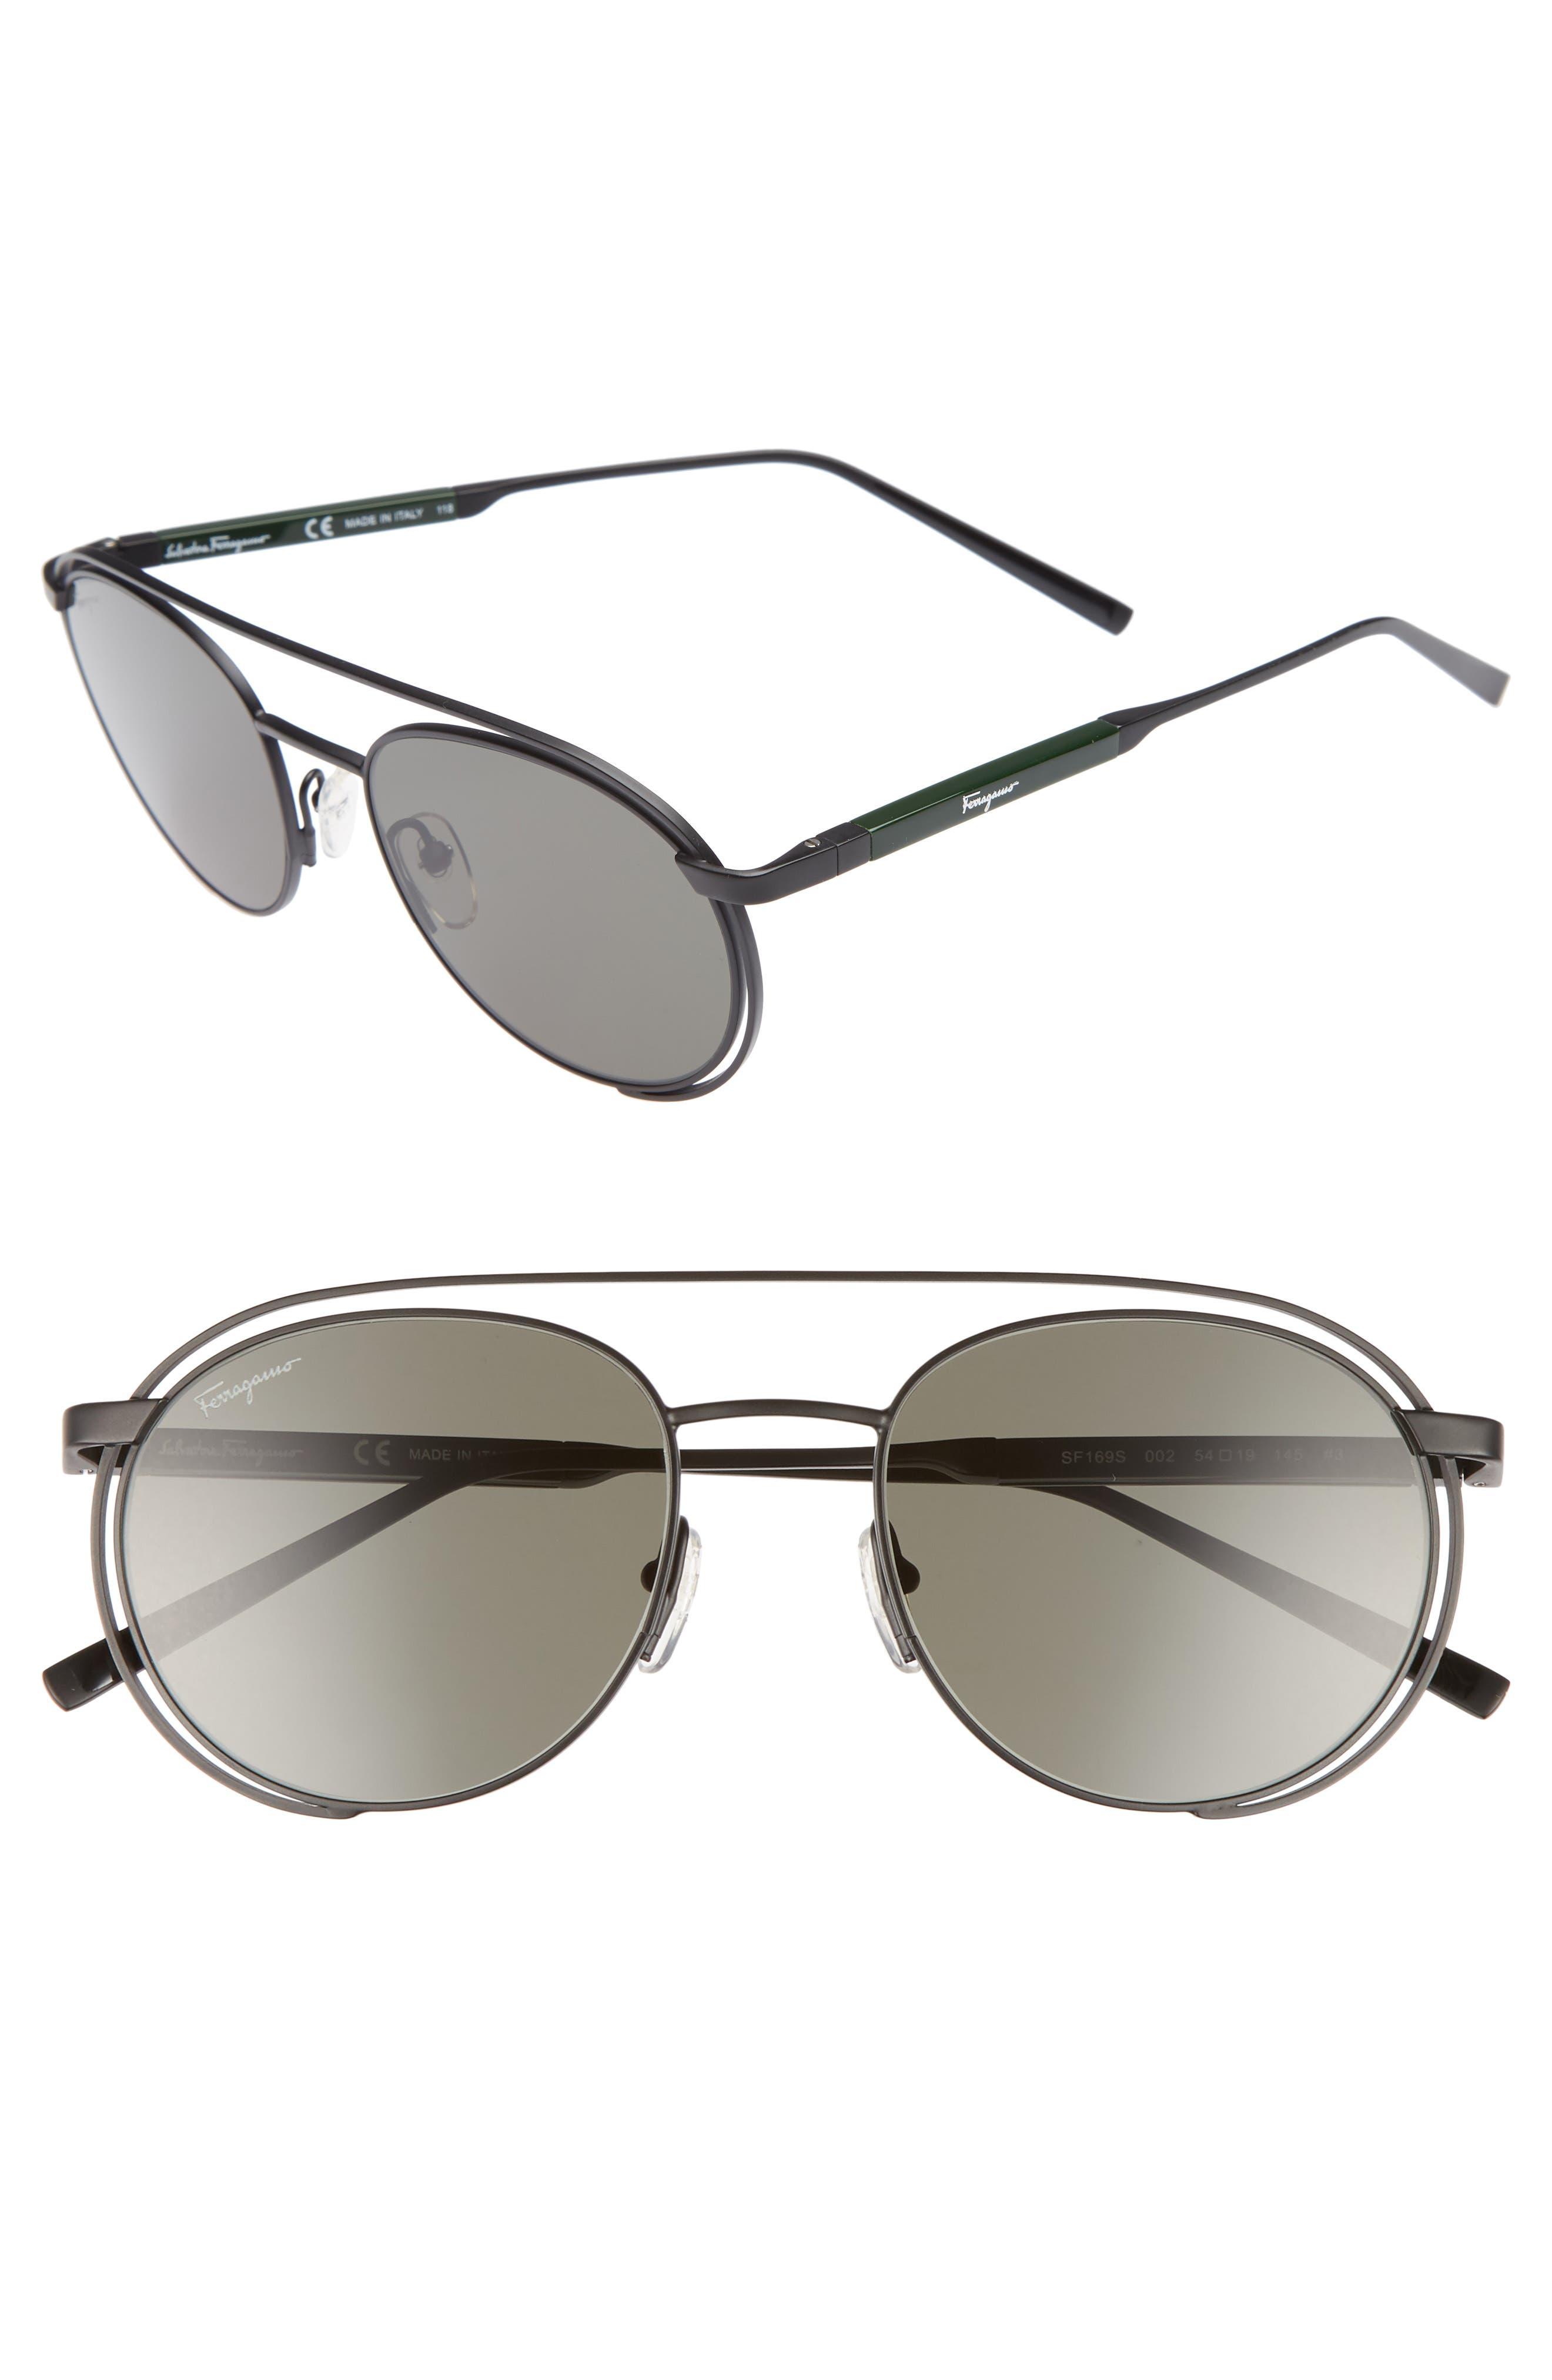 SALVATORE FERRAGAMO, 54mm Round Sunglasses, Main thumbnail 1, color, MATTE BLACK